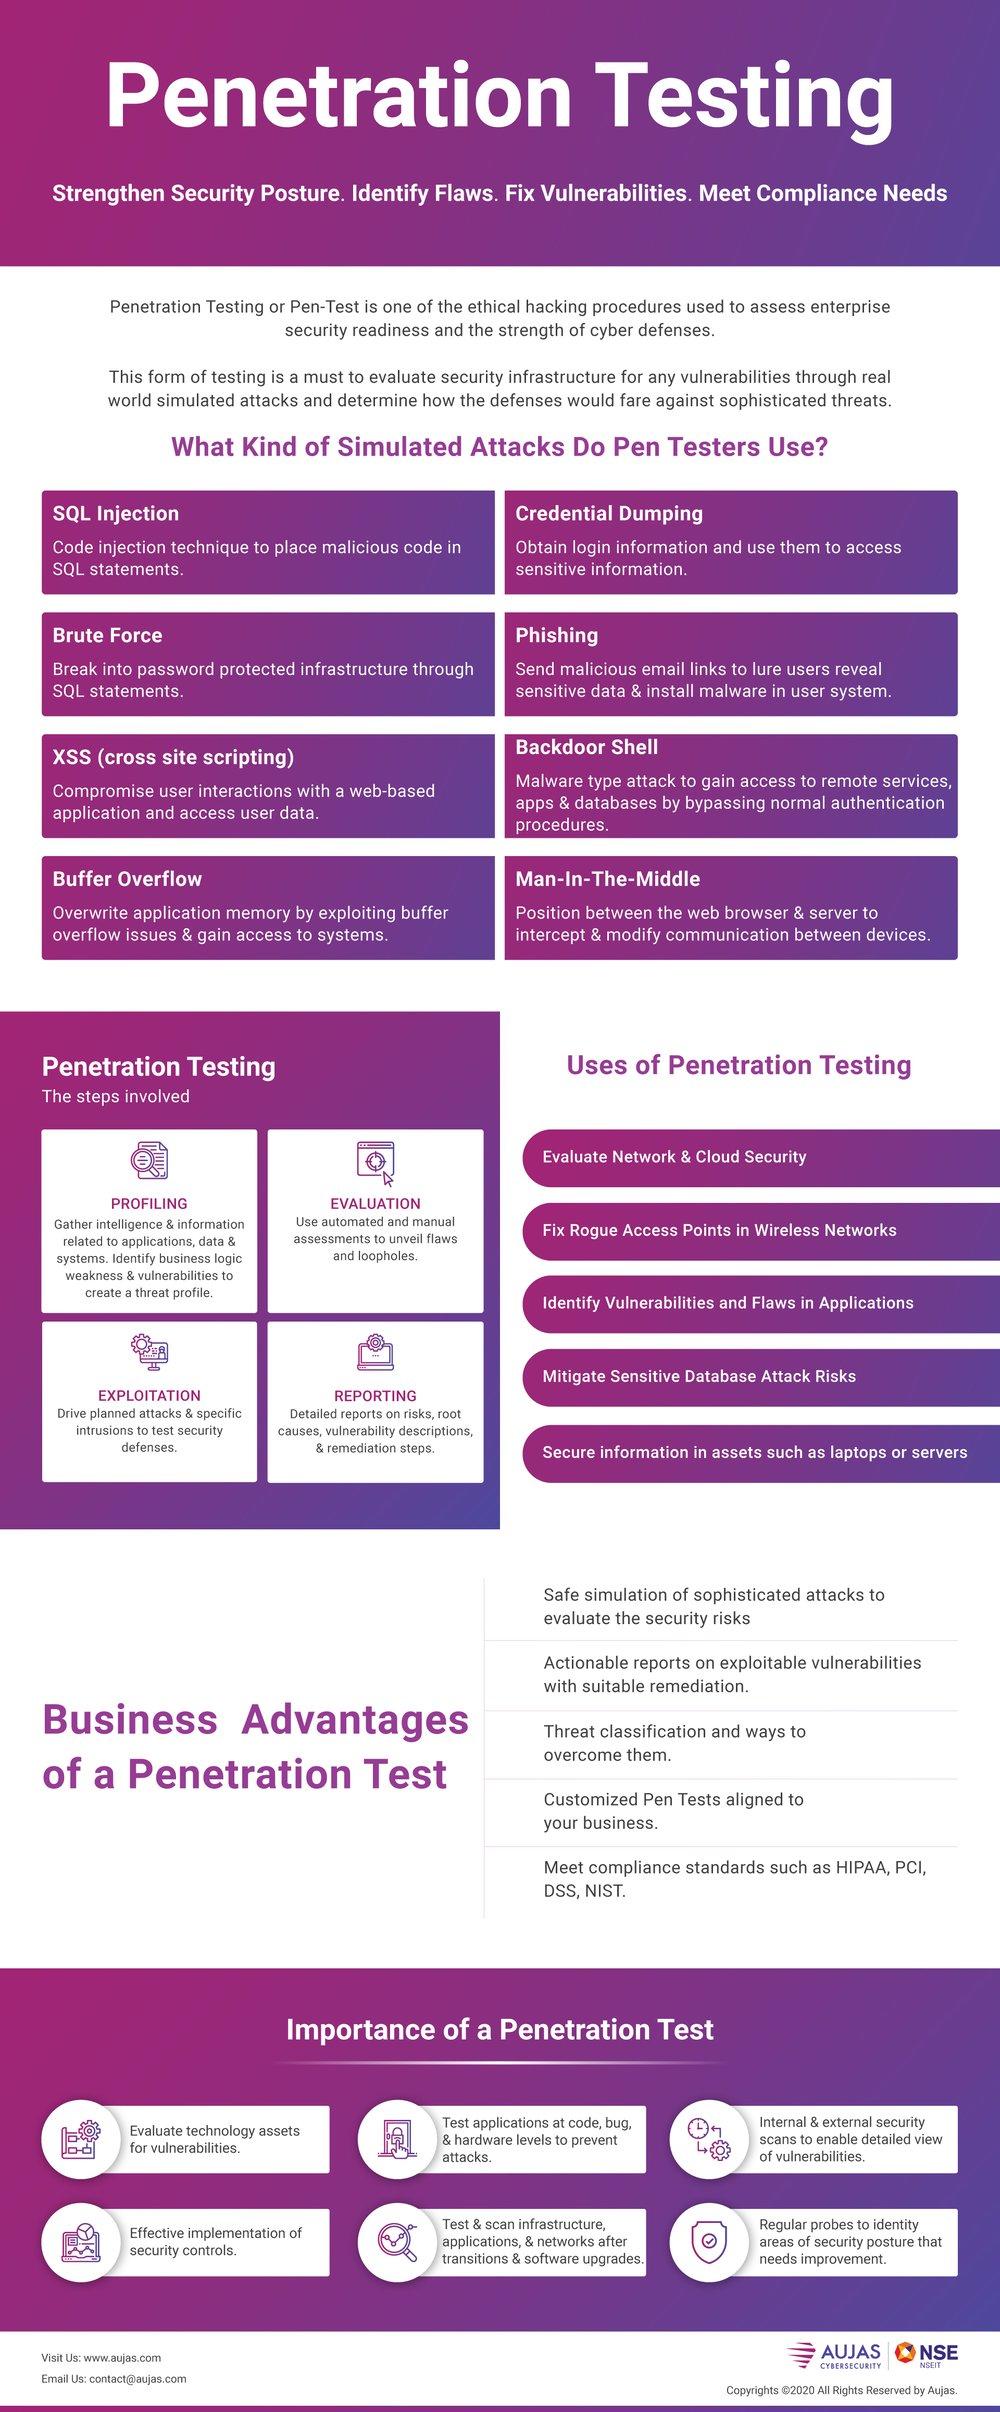 Penetration testing Advantages